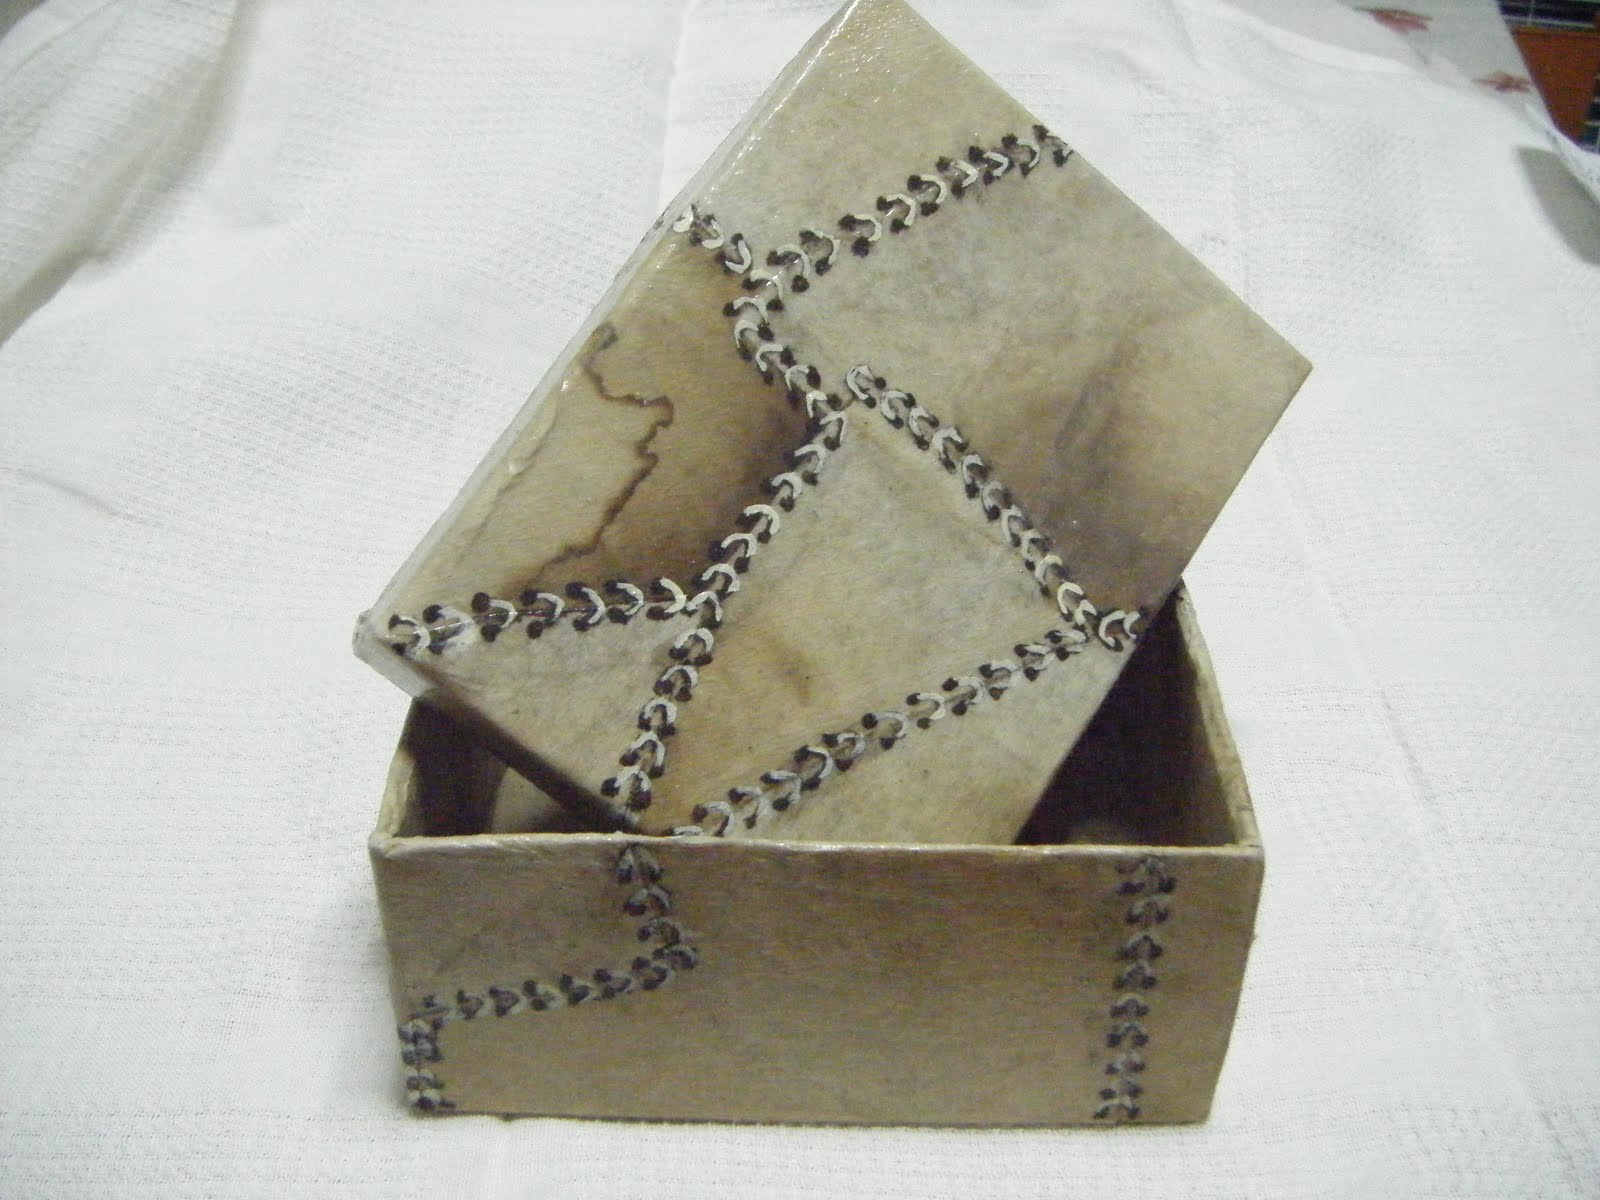 Manualidades de mari caja de zapatos reciclada - Cajas transparentes para zapatos ...